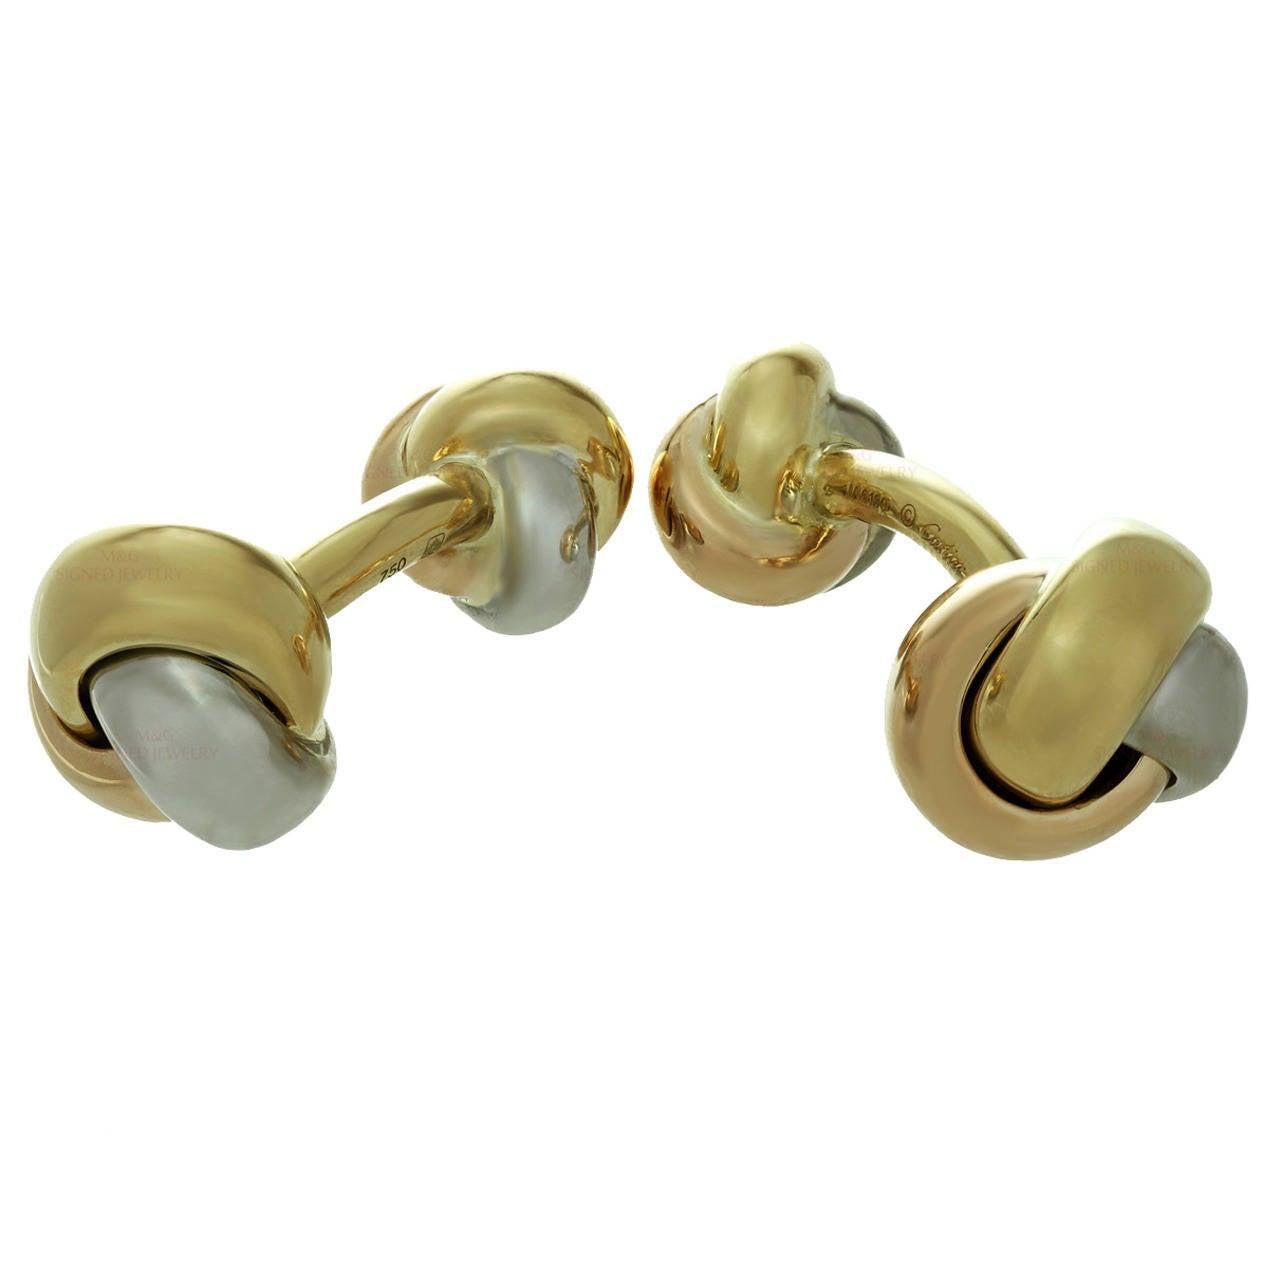 Cartier Trinity Tri-Gold Classic Knot Cufflinks